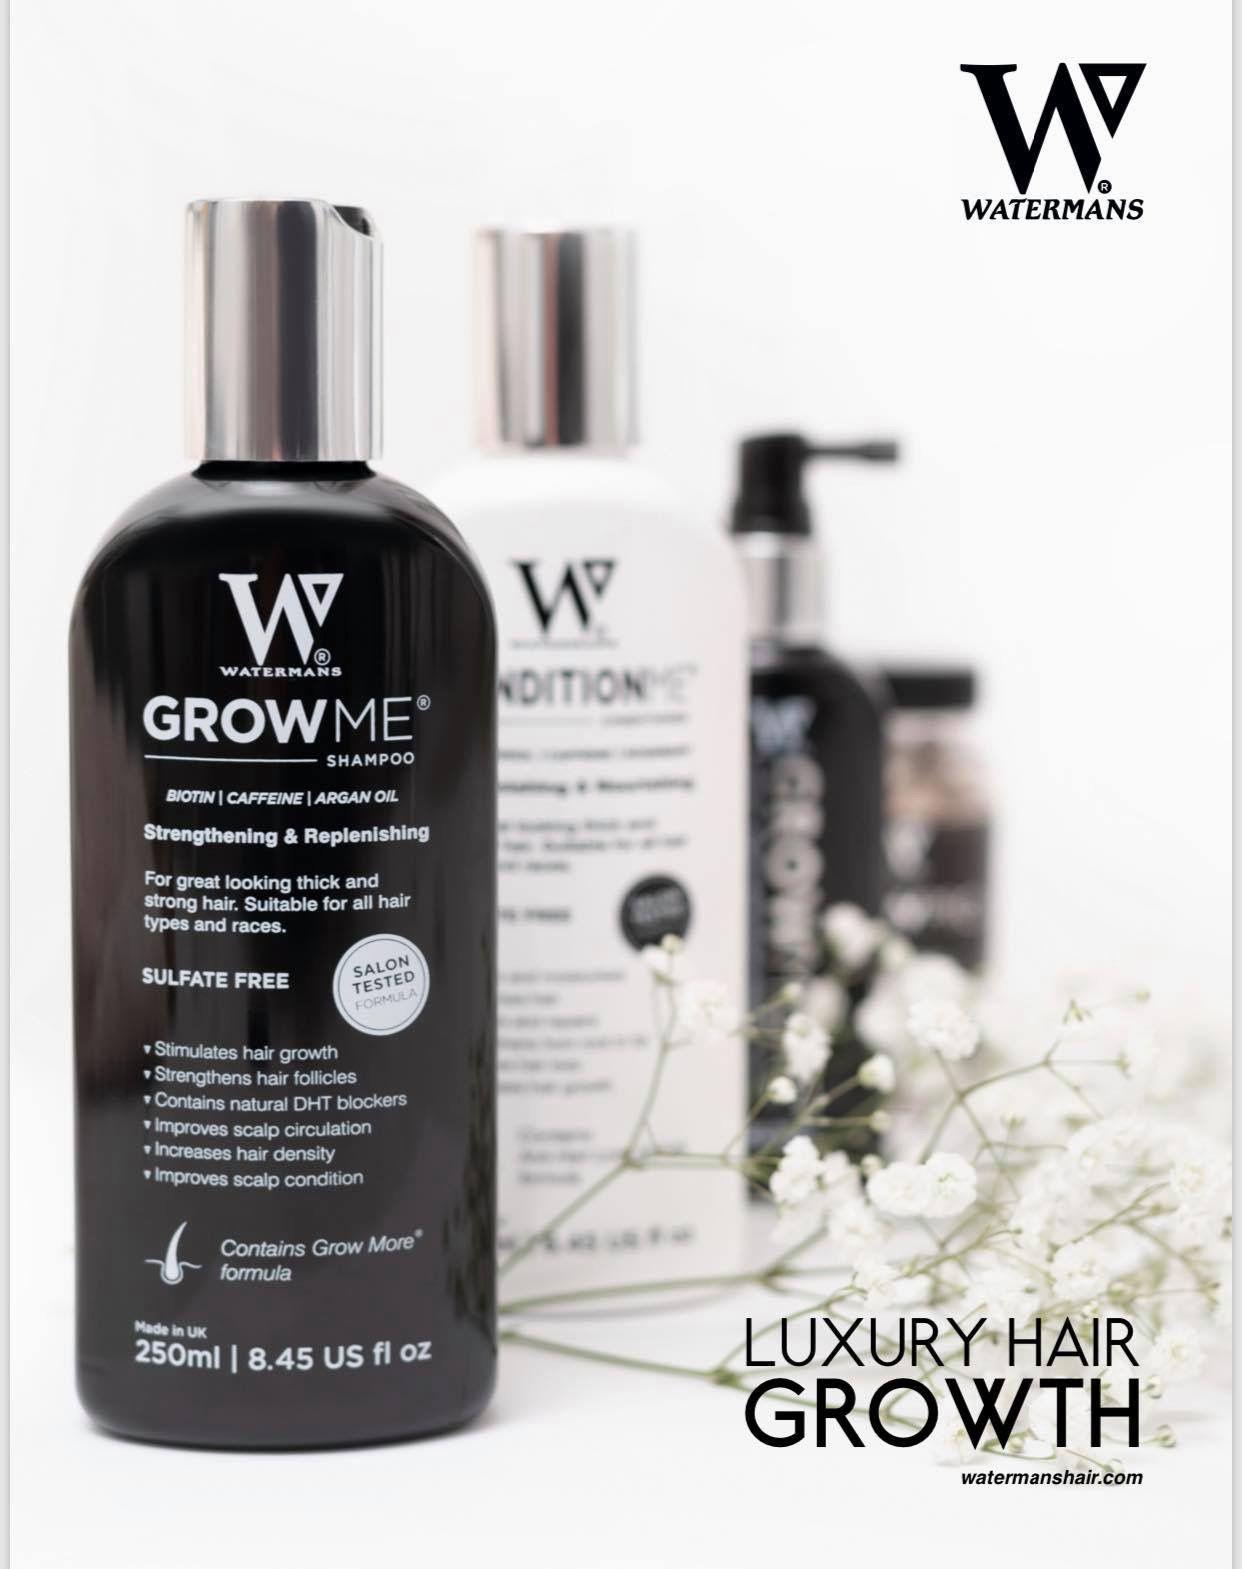 Waterman S Growth Shampoo Natural Dht Blocker Hair Growth Shampoo